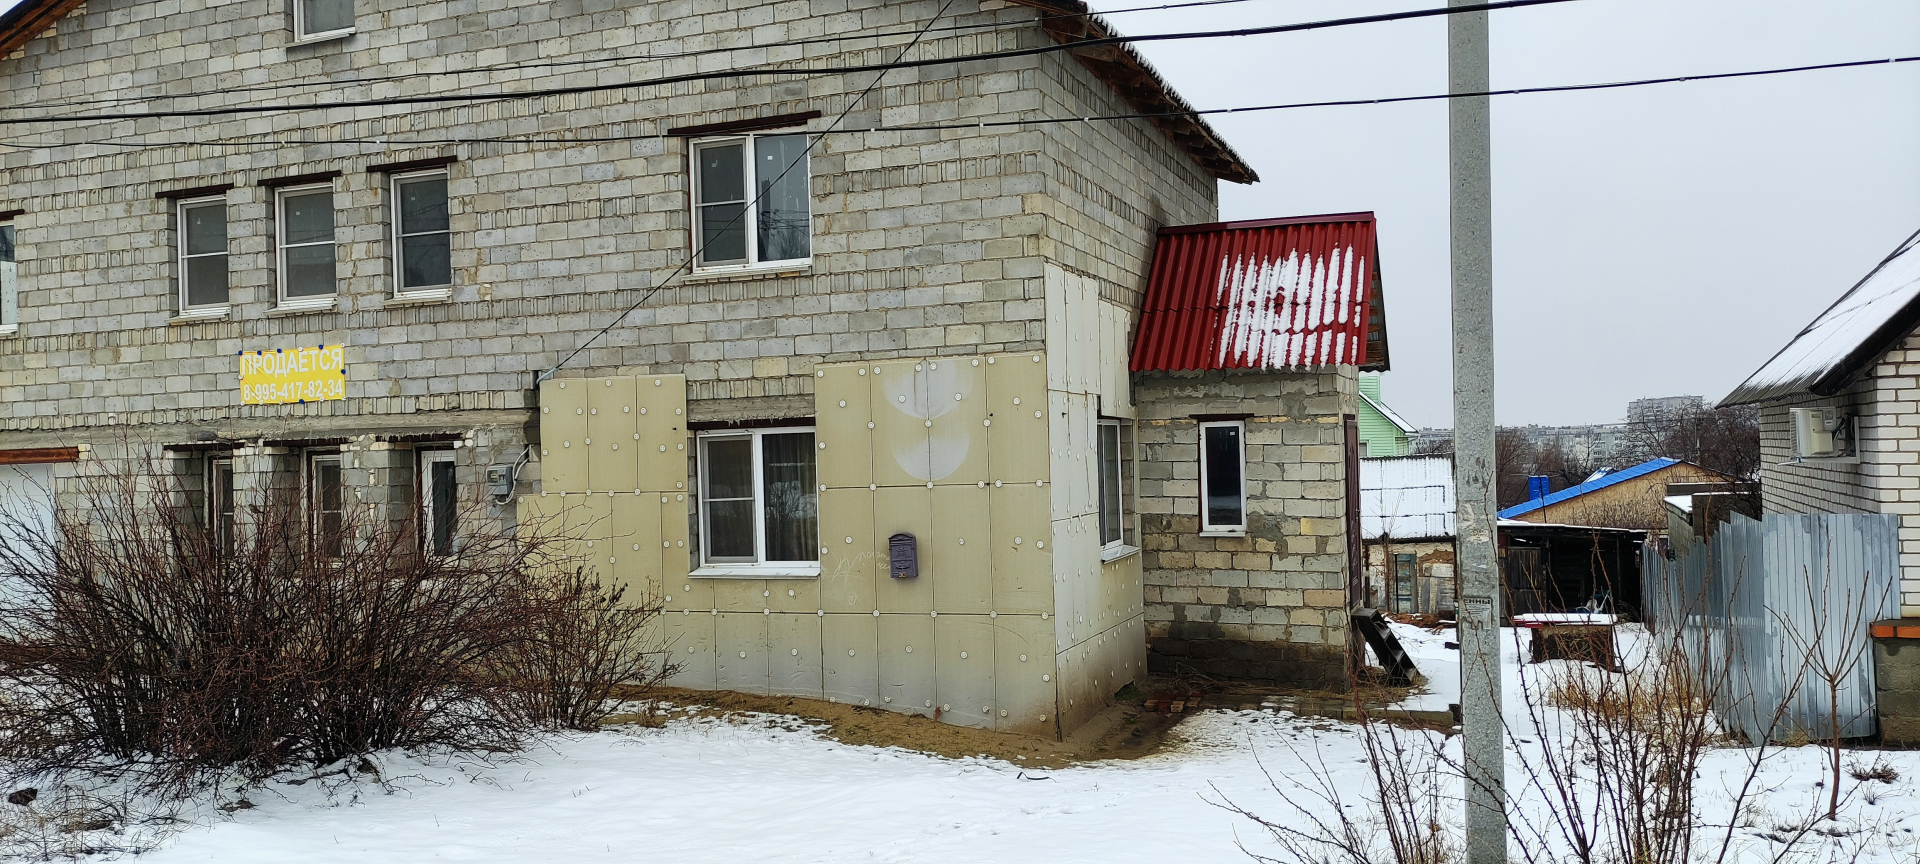 Продажа дома, 360м <sup>2</sup>, Волгоград, улица Героев Малой Земли,  дом 30